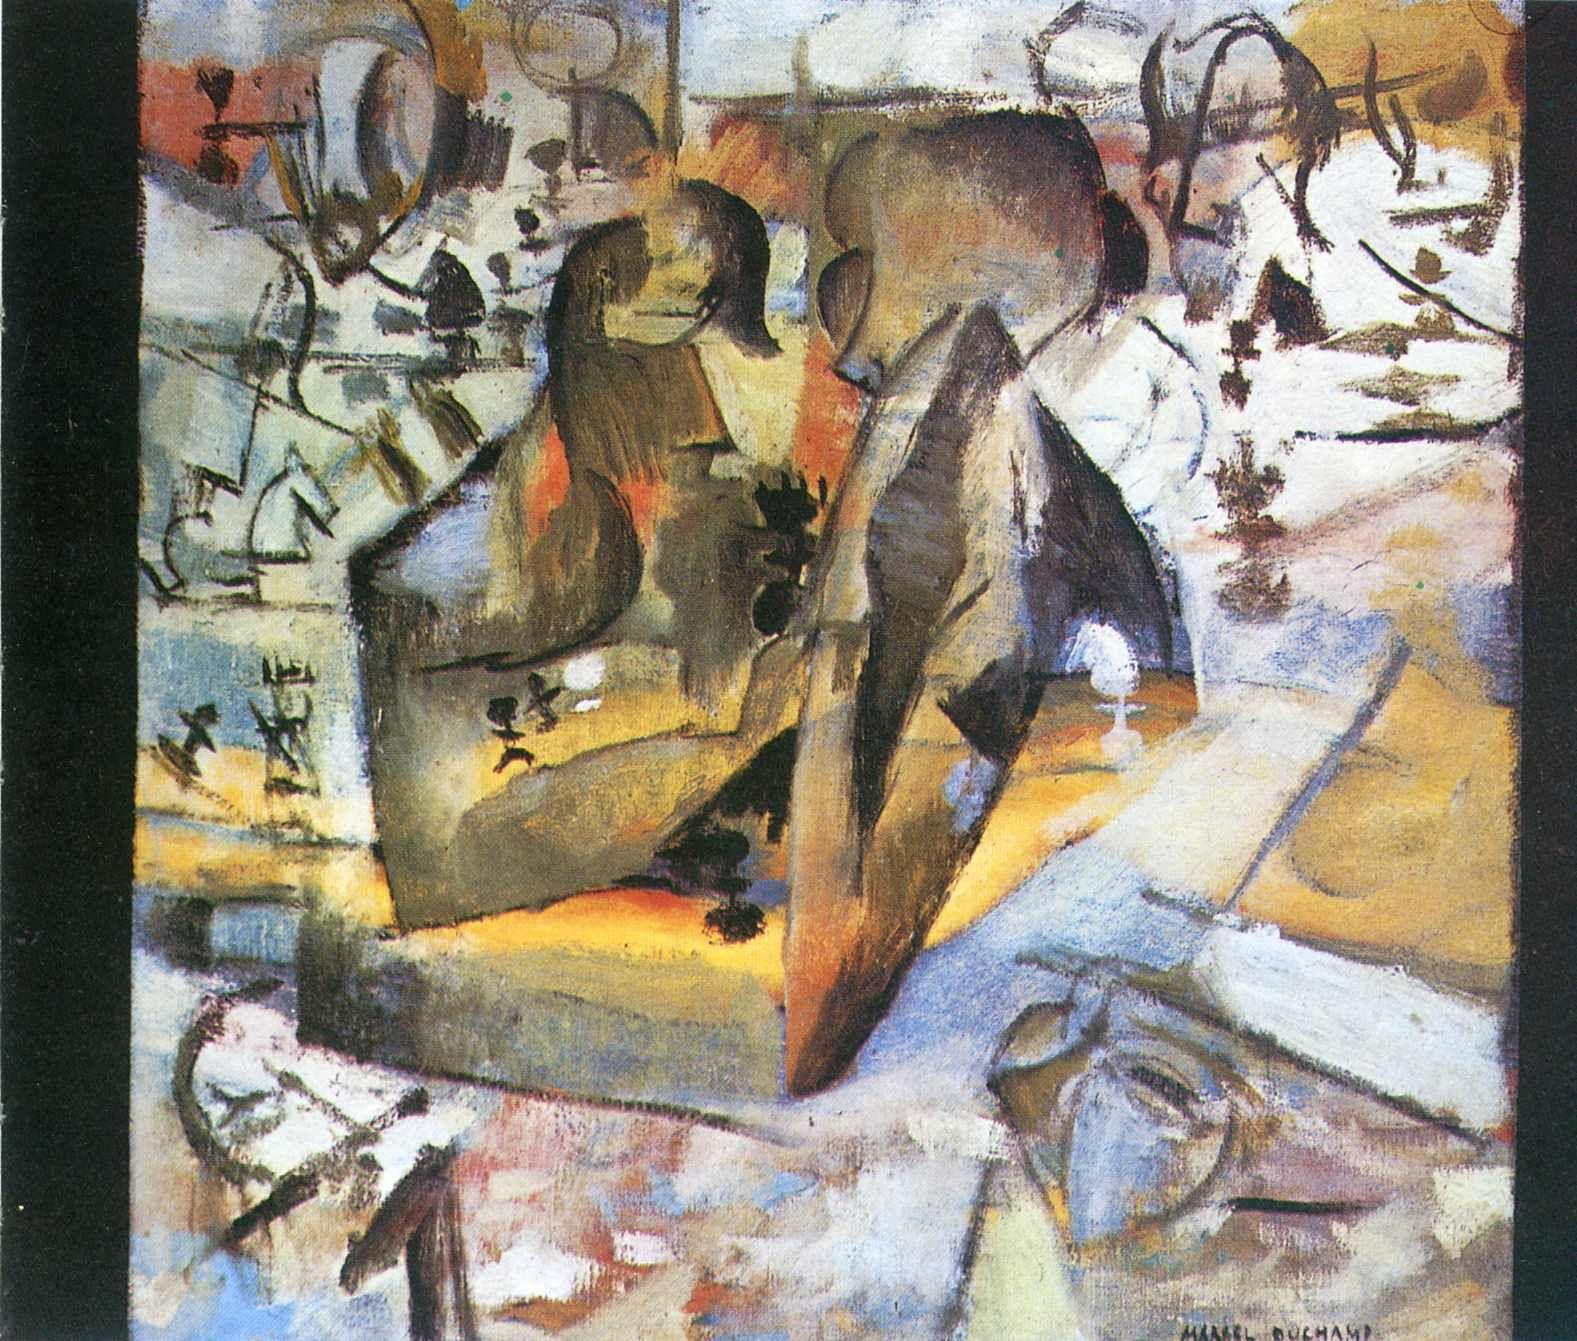 The Chess Players by artistduchamp futurism frenchart